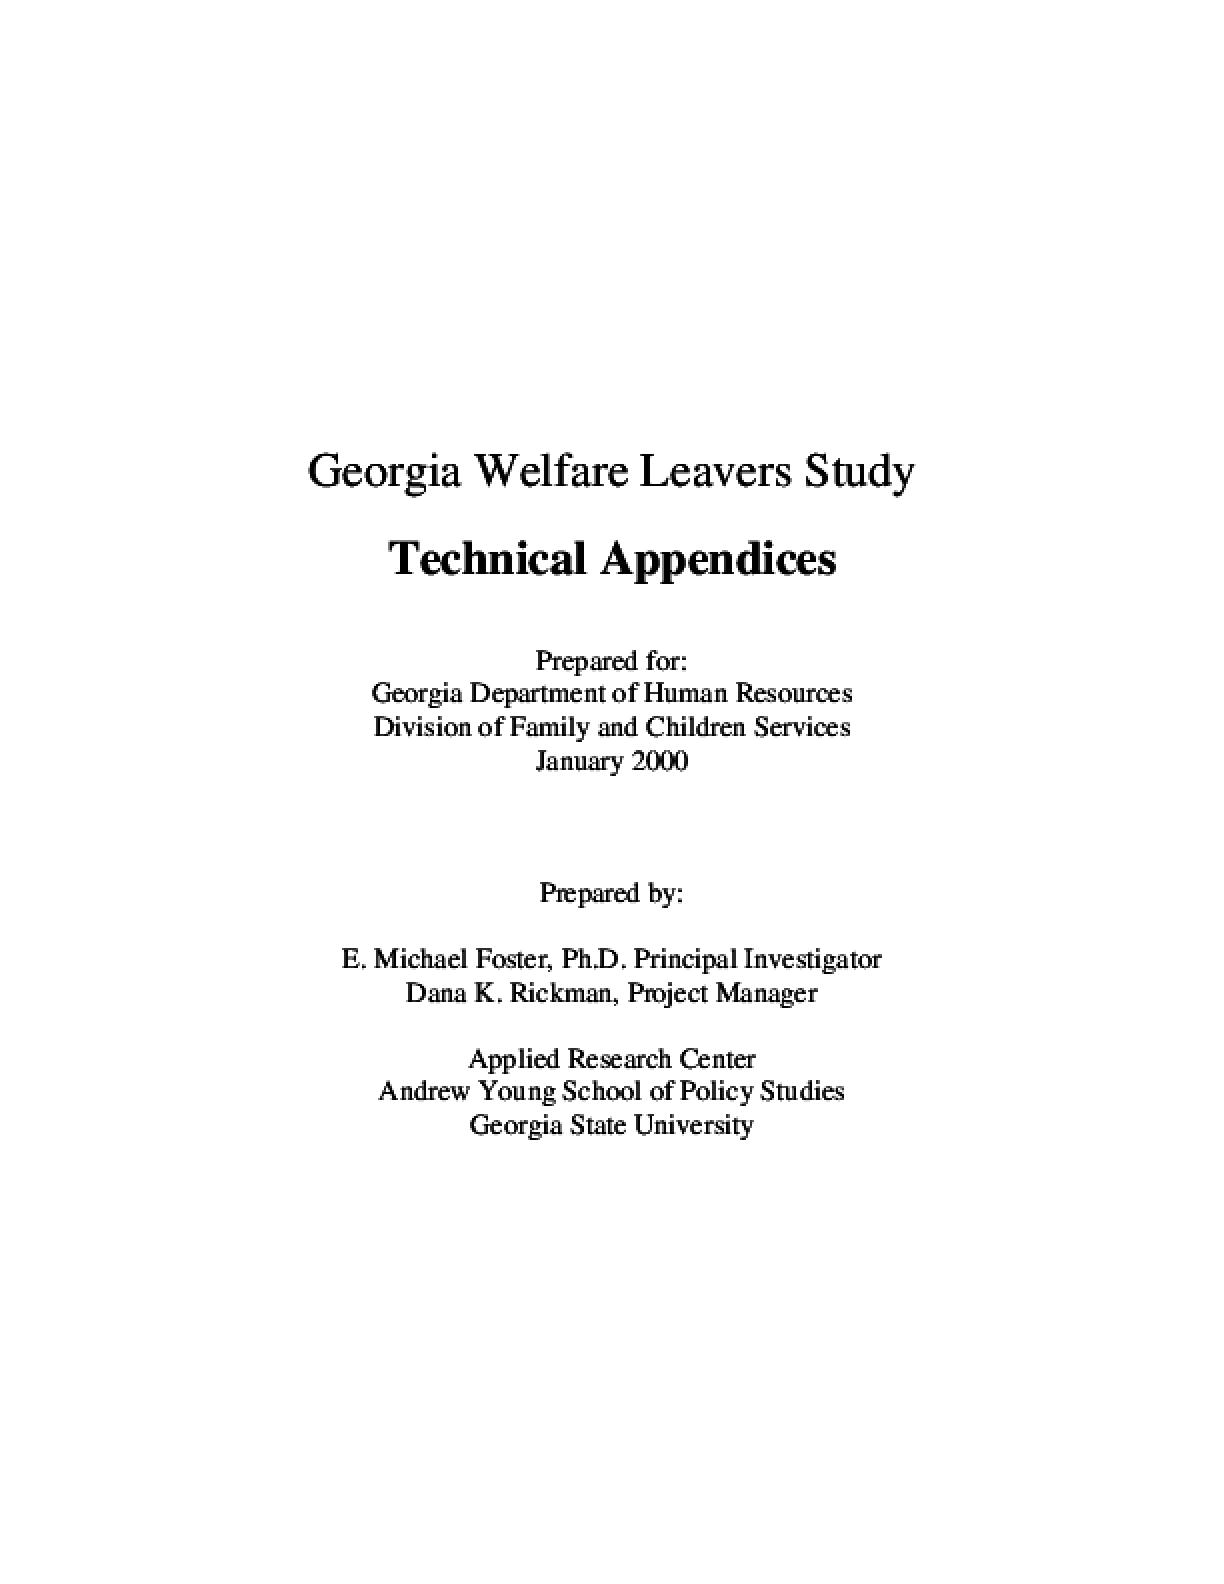 Georgia Welfare Leavers Study - Technical Appendices